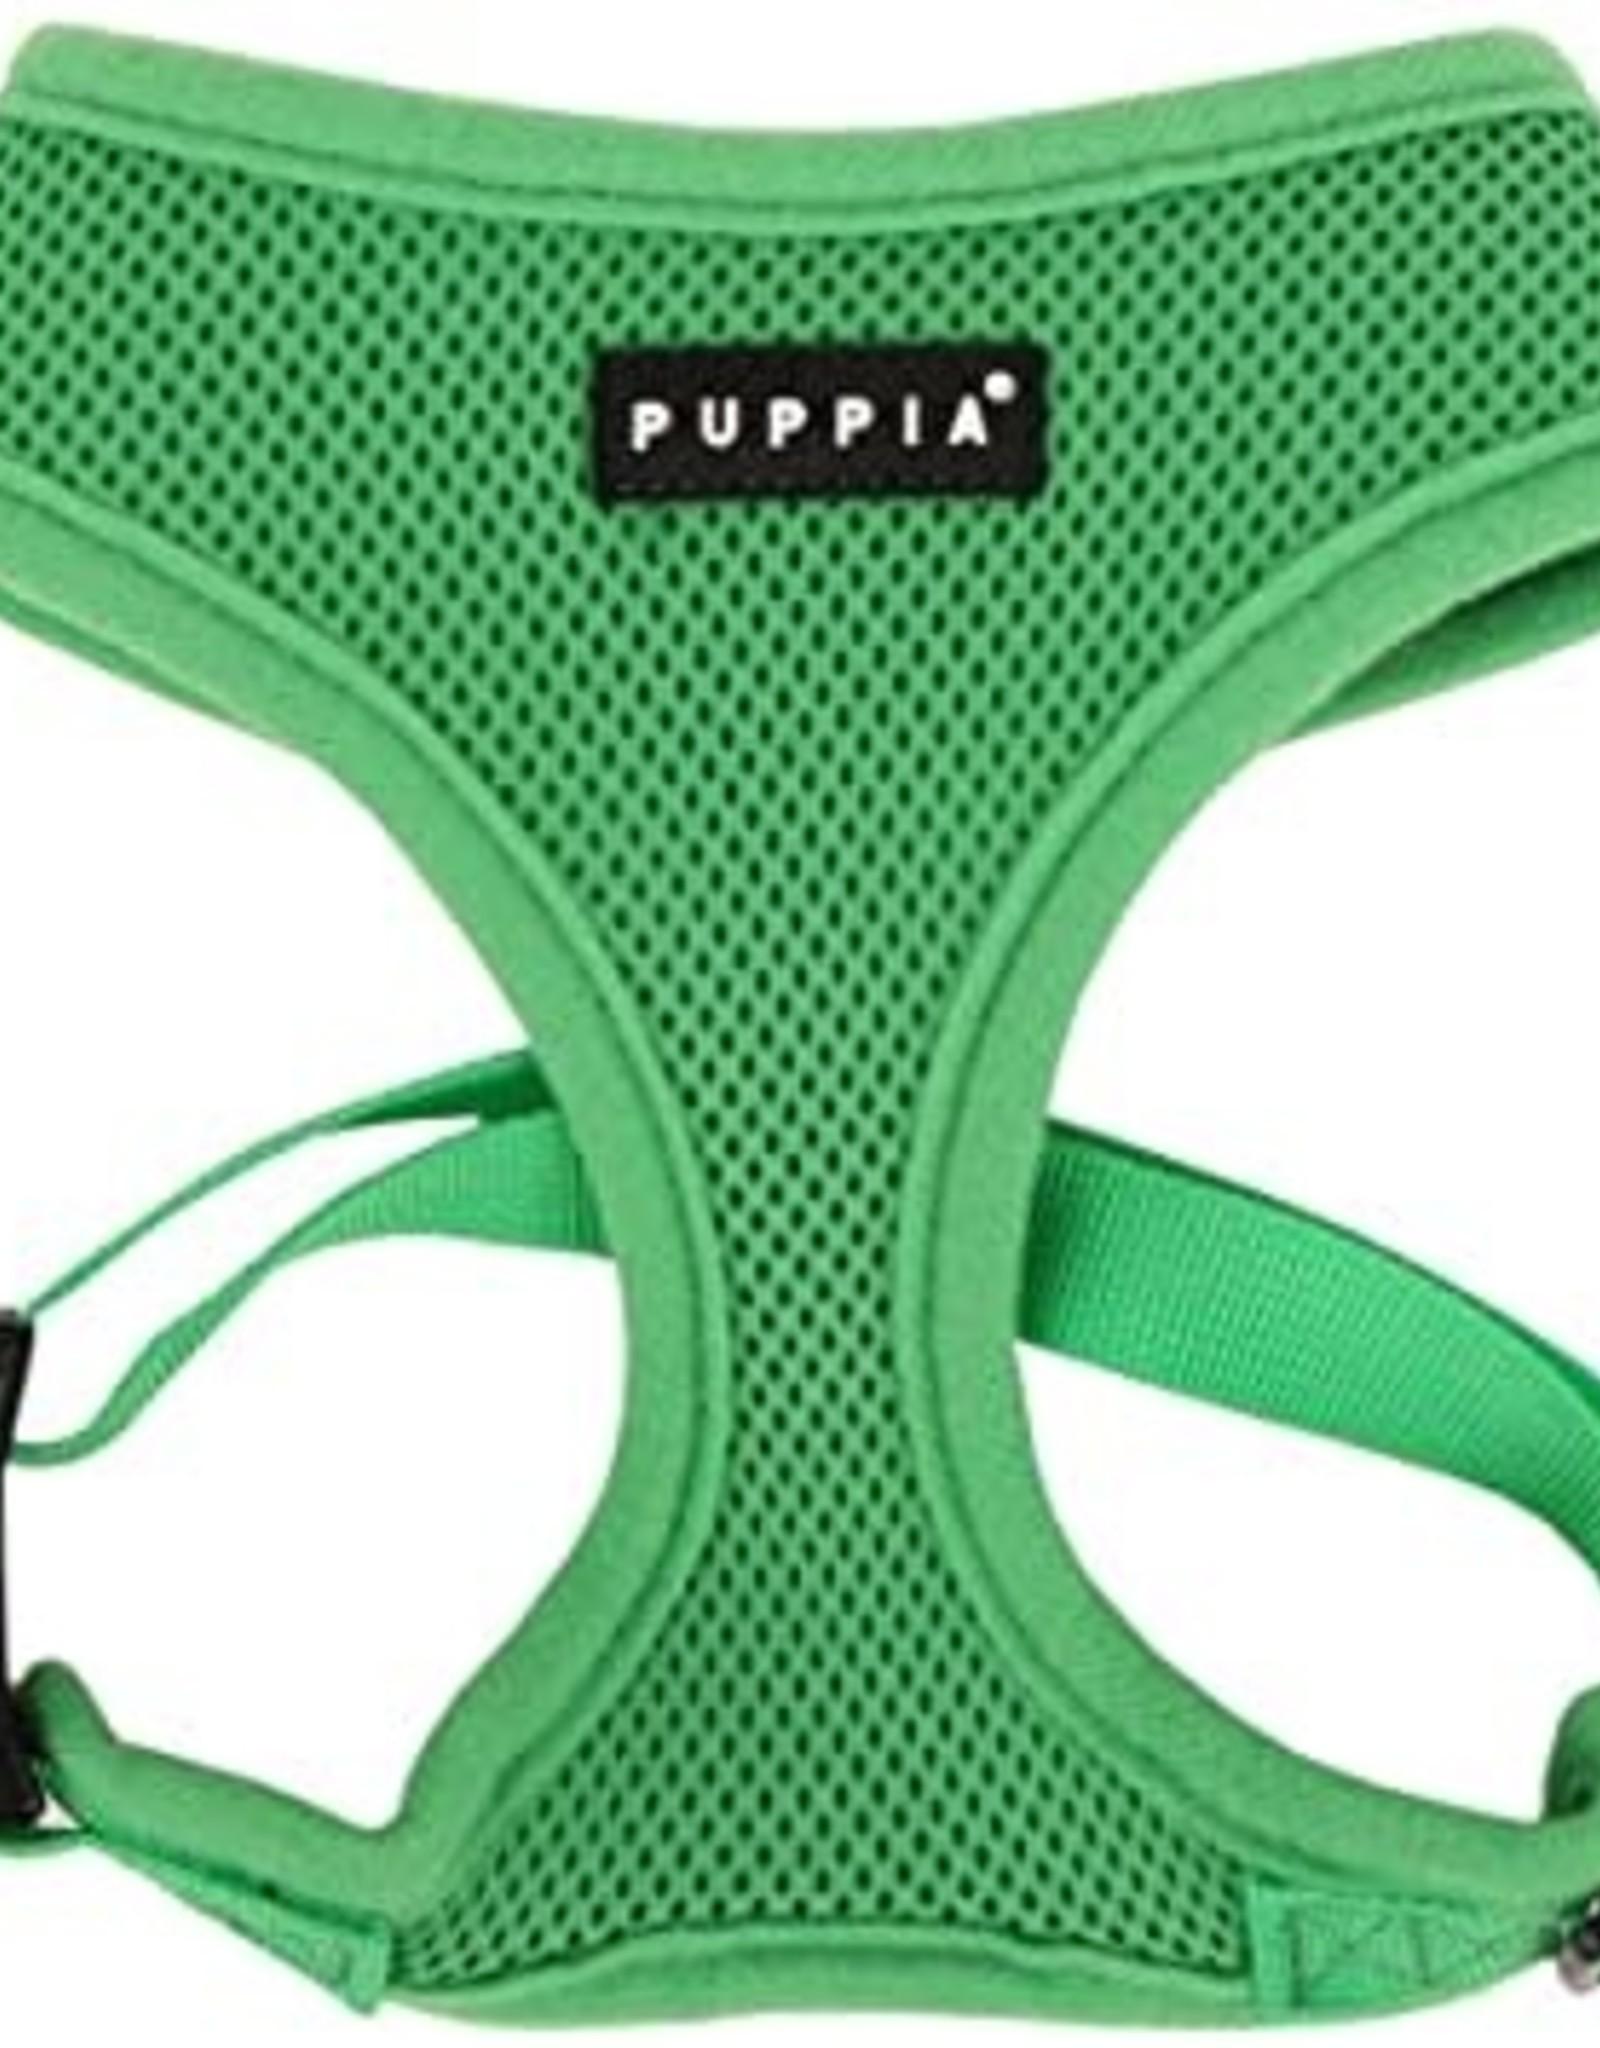 Puppia Puppia Green Harness